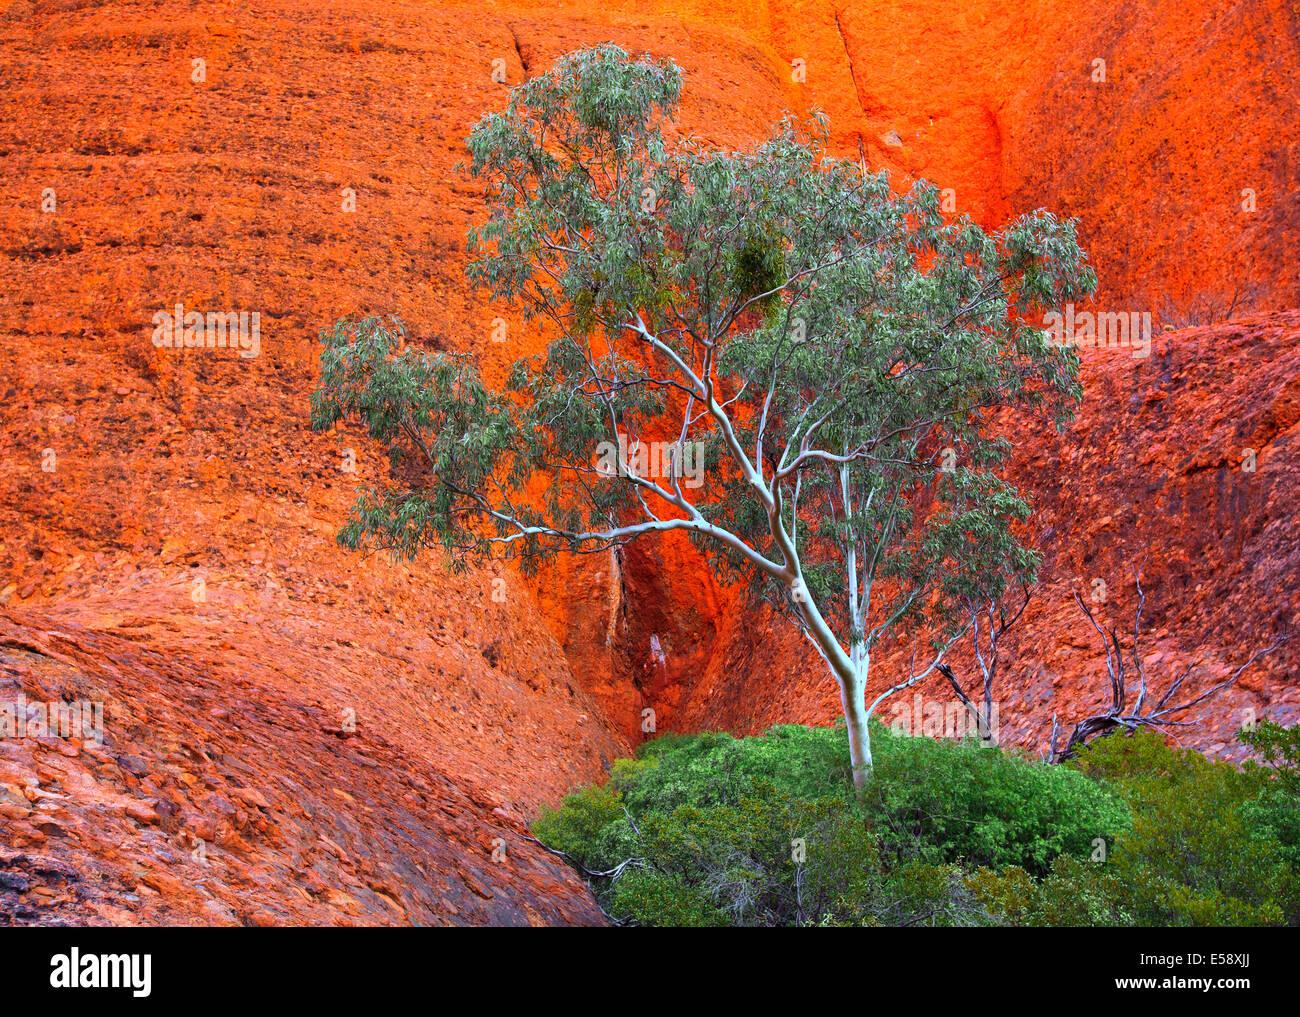 Zentralaustralien Nordterritorium Olgas Kata Juta Stockbild